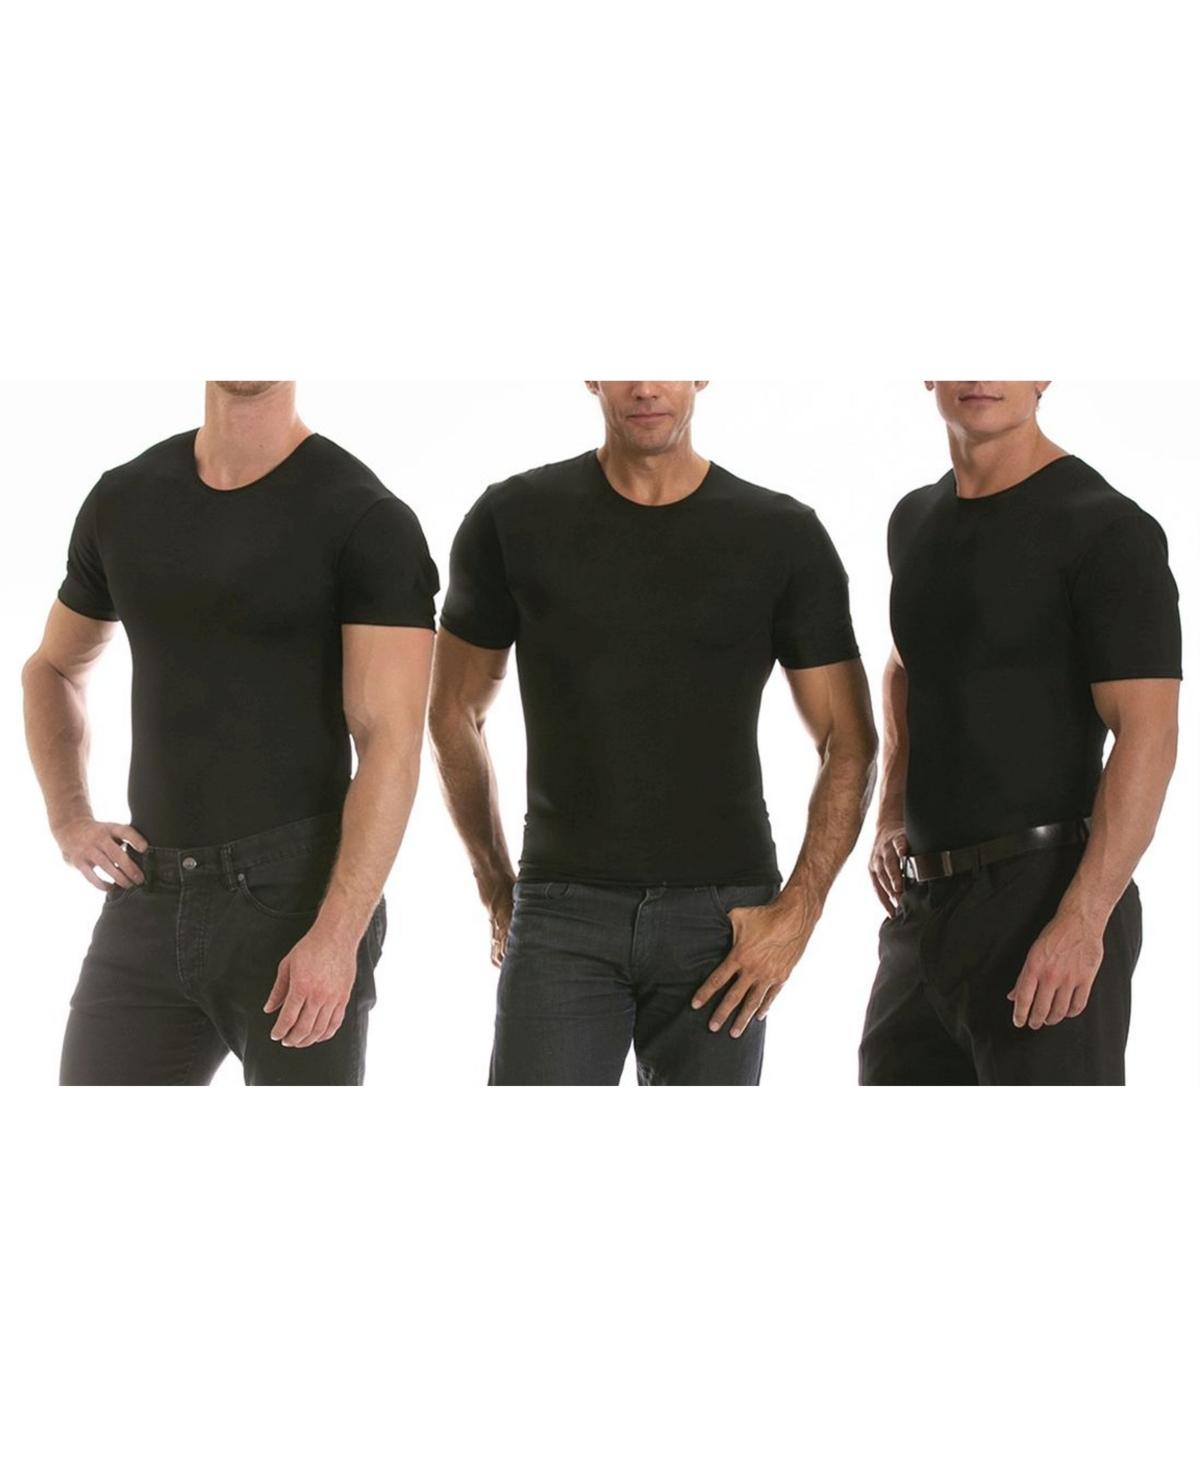 Men's Big & Tall Insta Slim 3 Pack Compression Short Sleeve Crew-Neck T-Shirts